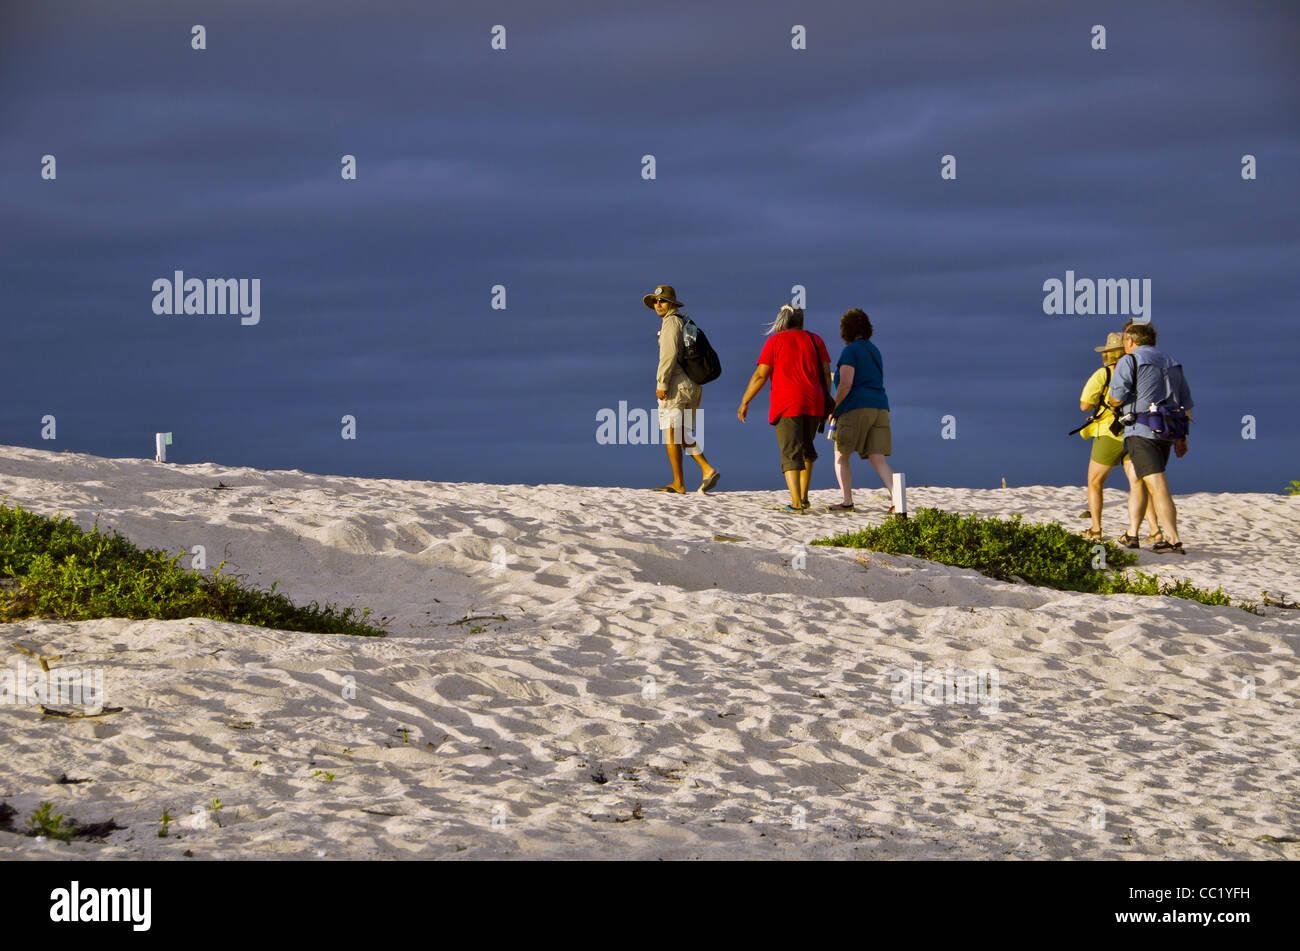 Tourists walking on Las Bachas Beach, Santa Cruz Island, Galapagos Islands, Ecuador - Stock Image